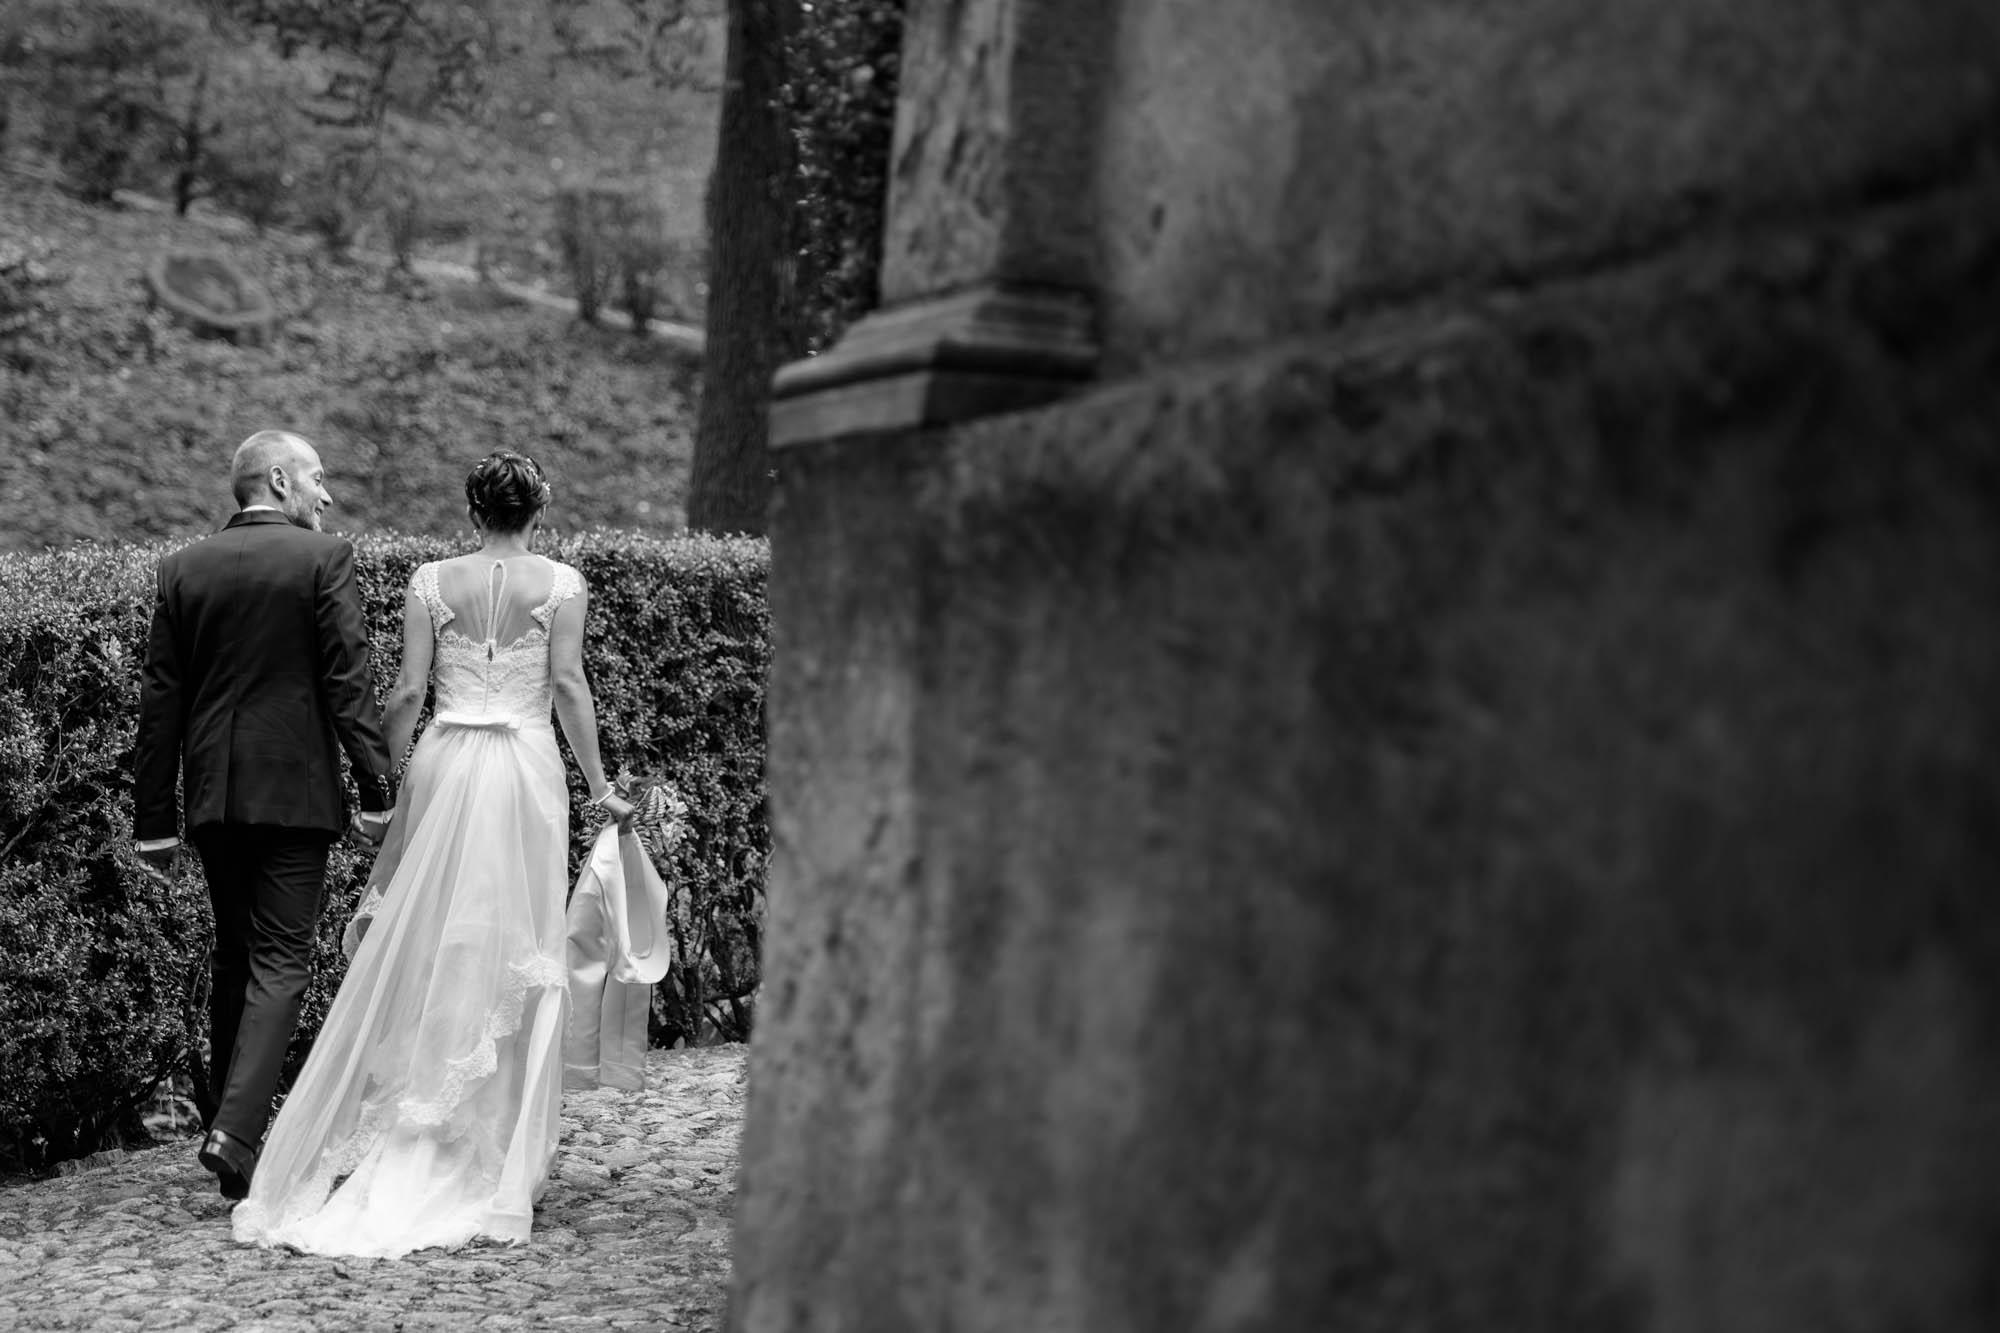 Valsesia Wedding - Fotografi per matrimoni a Borgosesia, Varallo, Quarona, Alagna e tutta la Valsesia